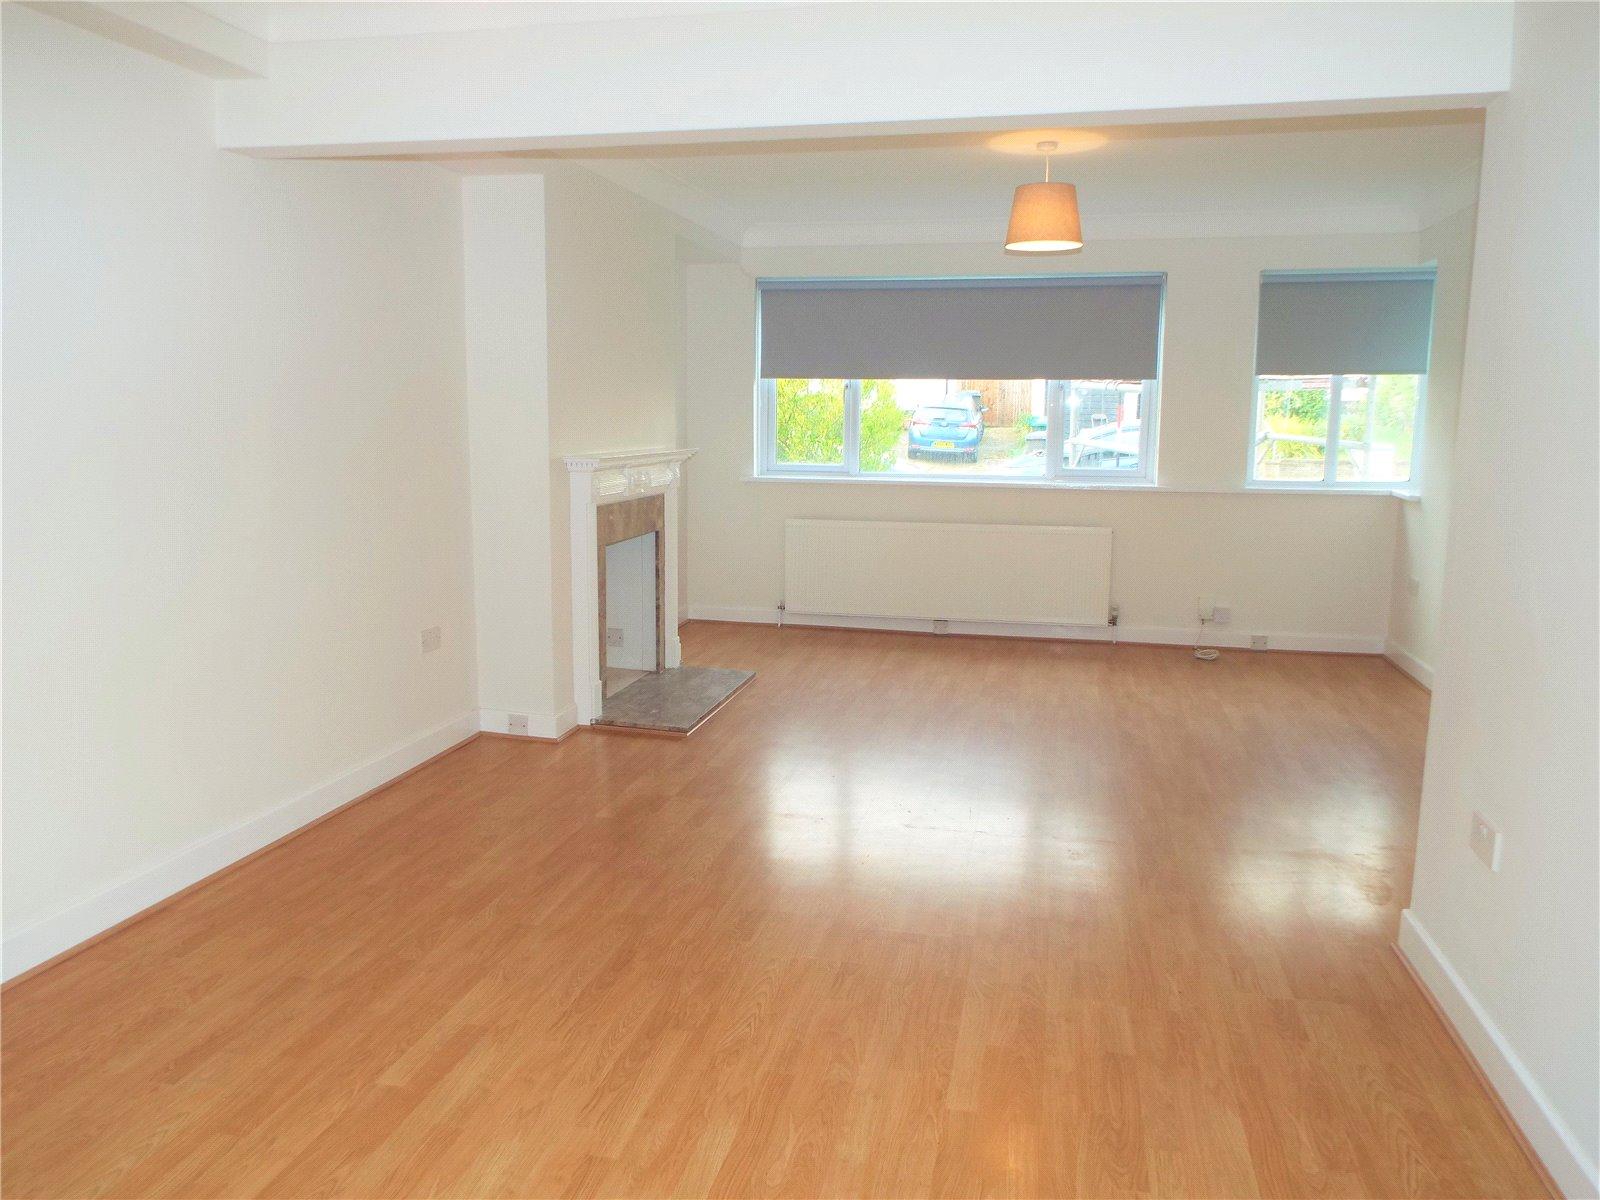 3 bed house to rent in Edgware, HA8 9QB, HA8